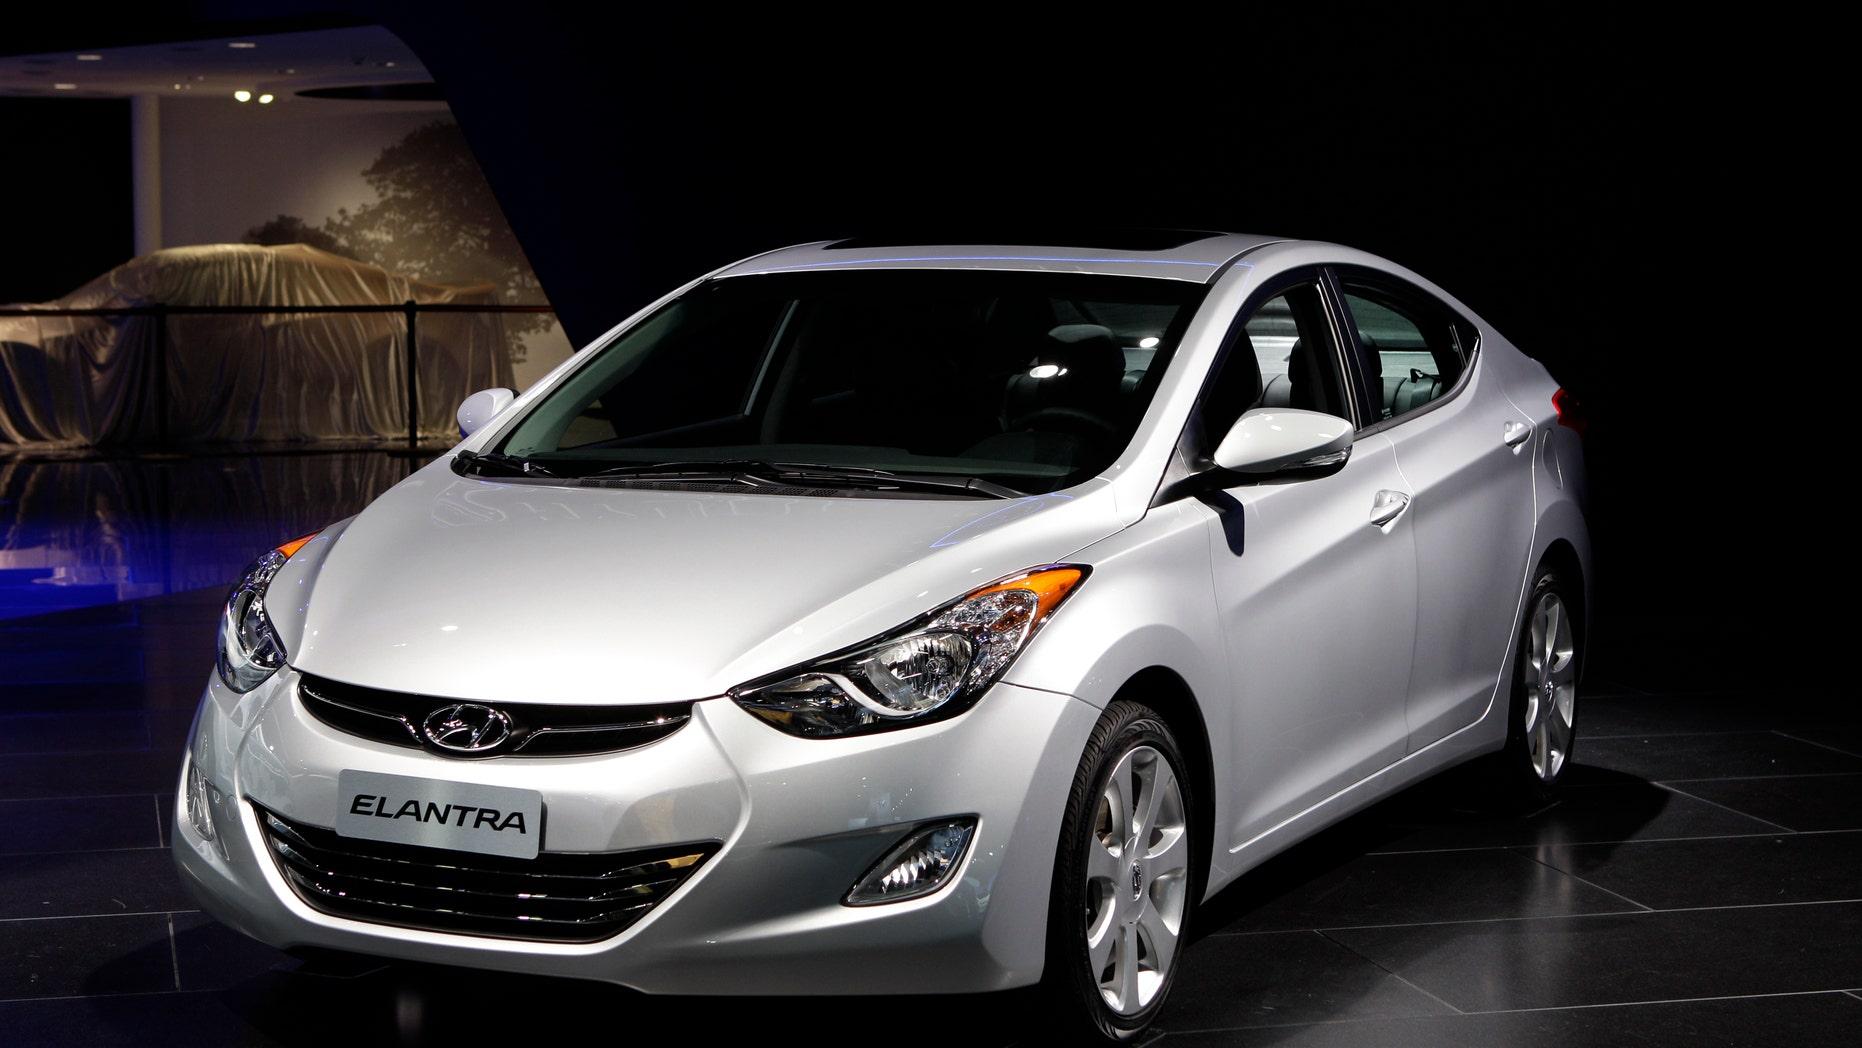 The 2012 Hyundai Elantra at the North American International Auto Show in Detroit. (AP Photo/Paul Sancya, File)